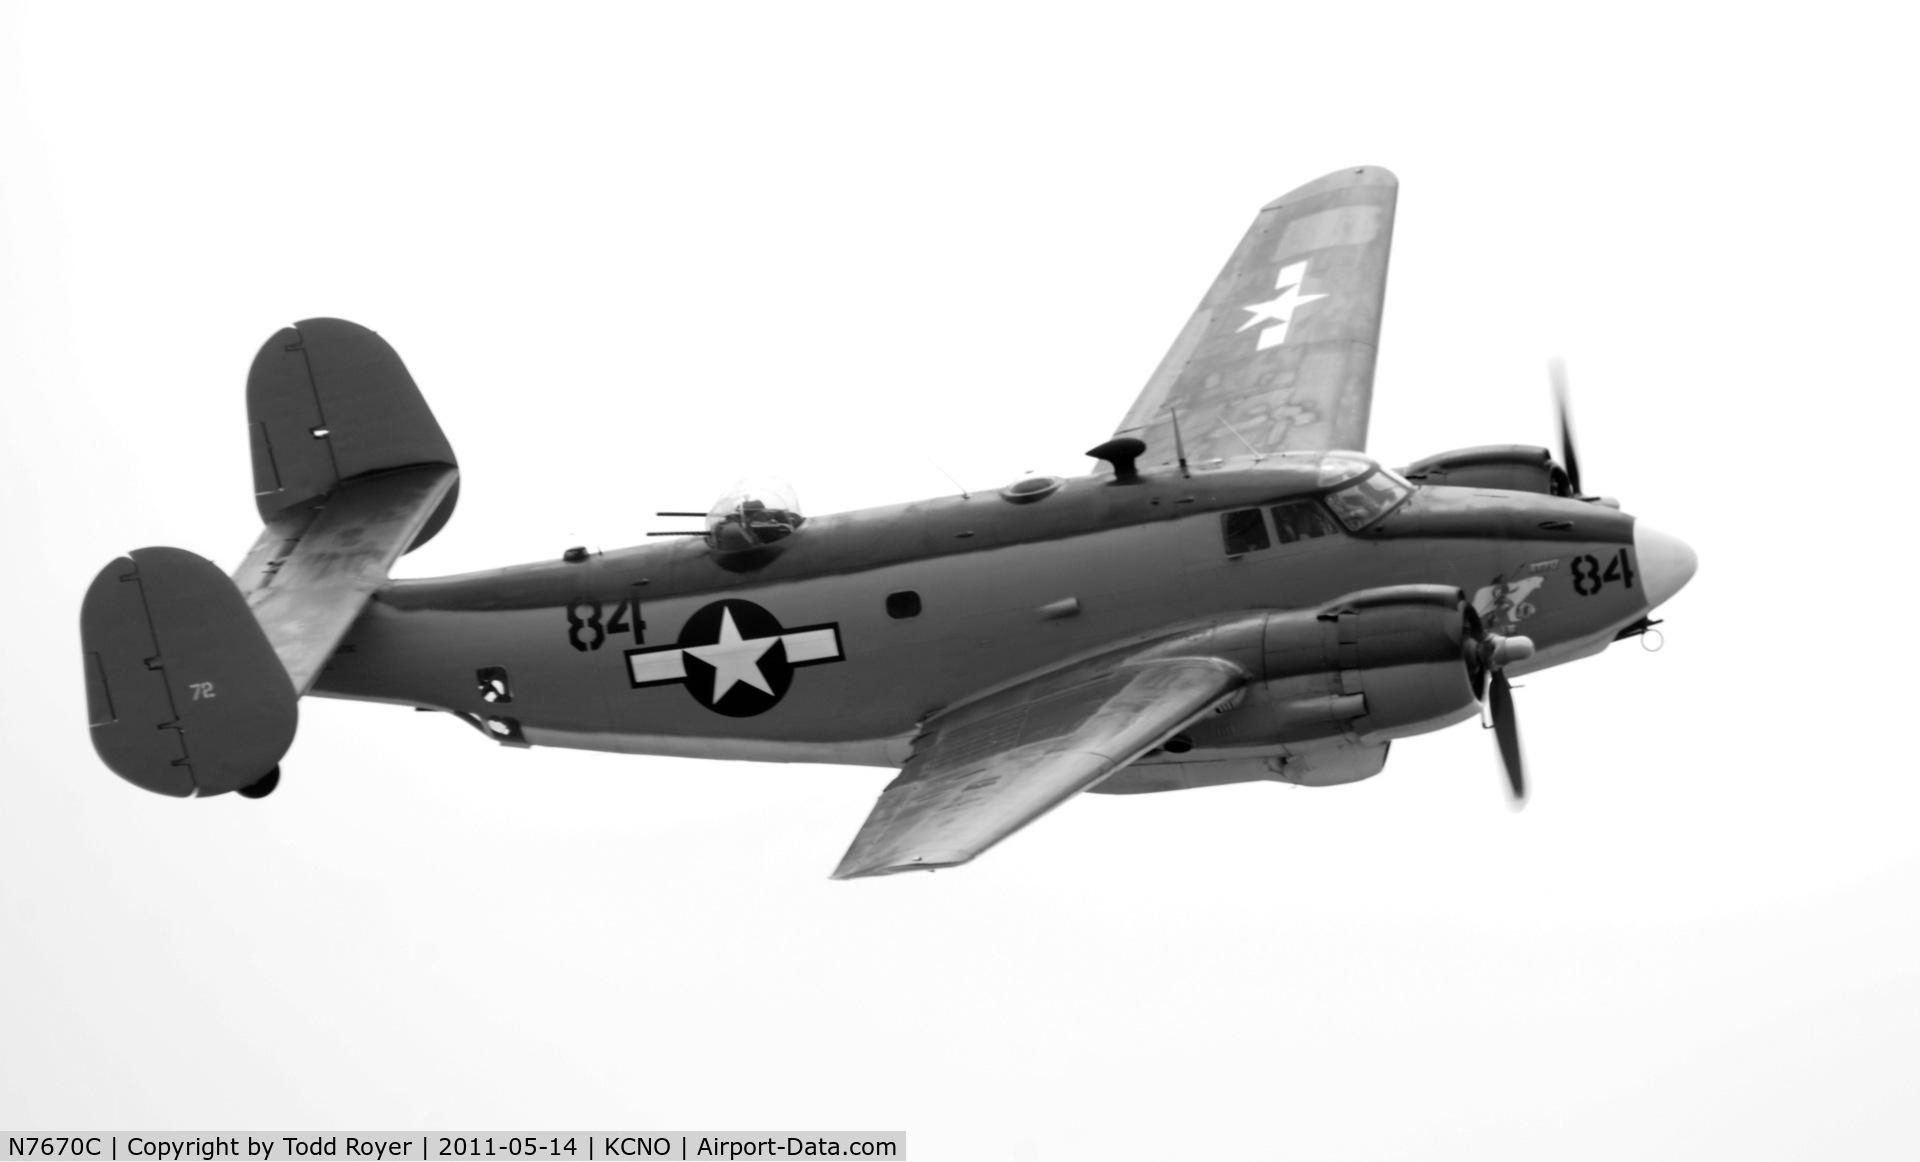 N7670C, 1957 Lockheed PV-2 Harpoon C/N 15-1438, Chino Airshow 2011